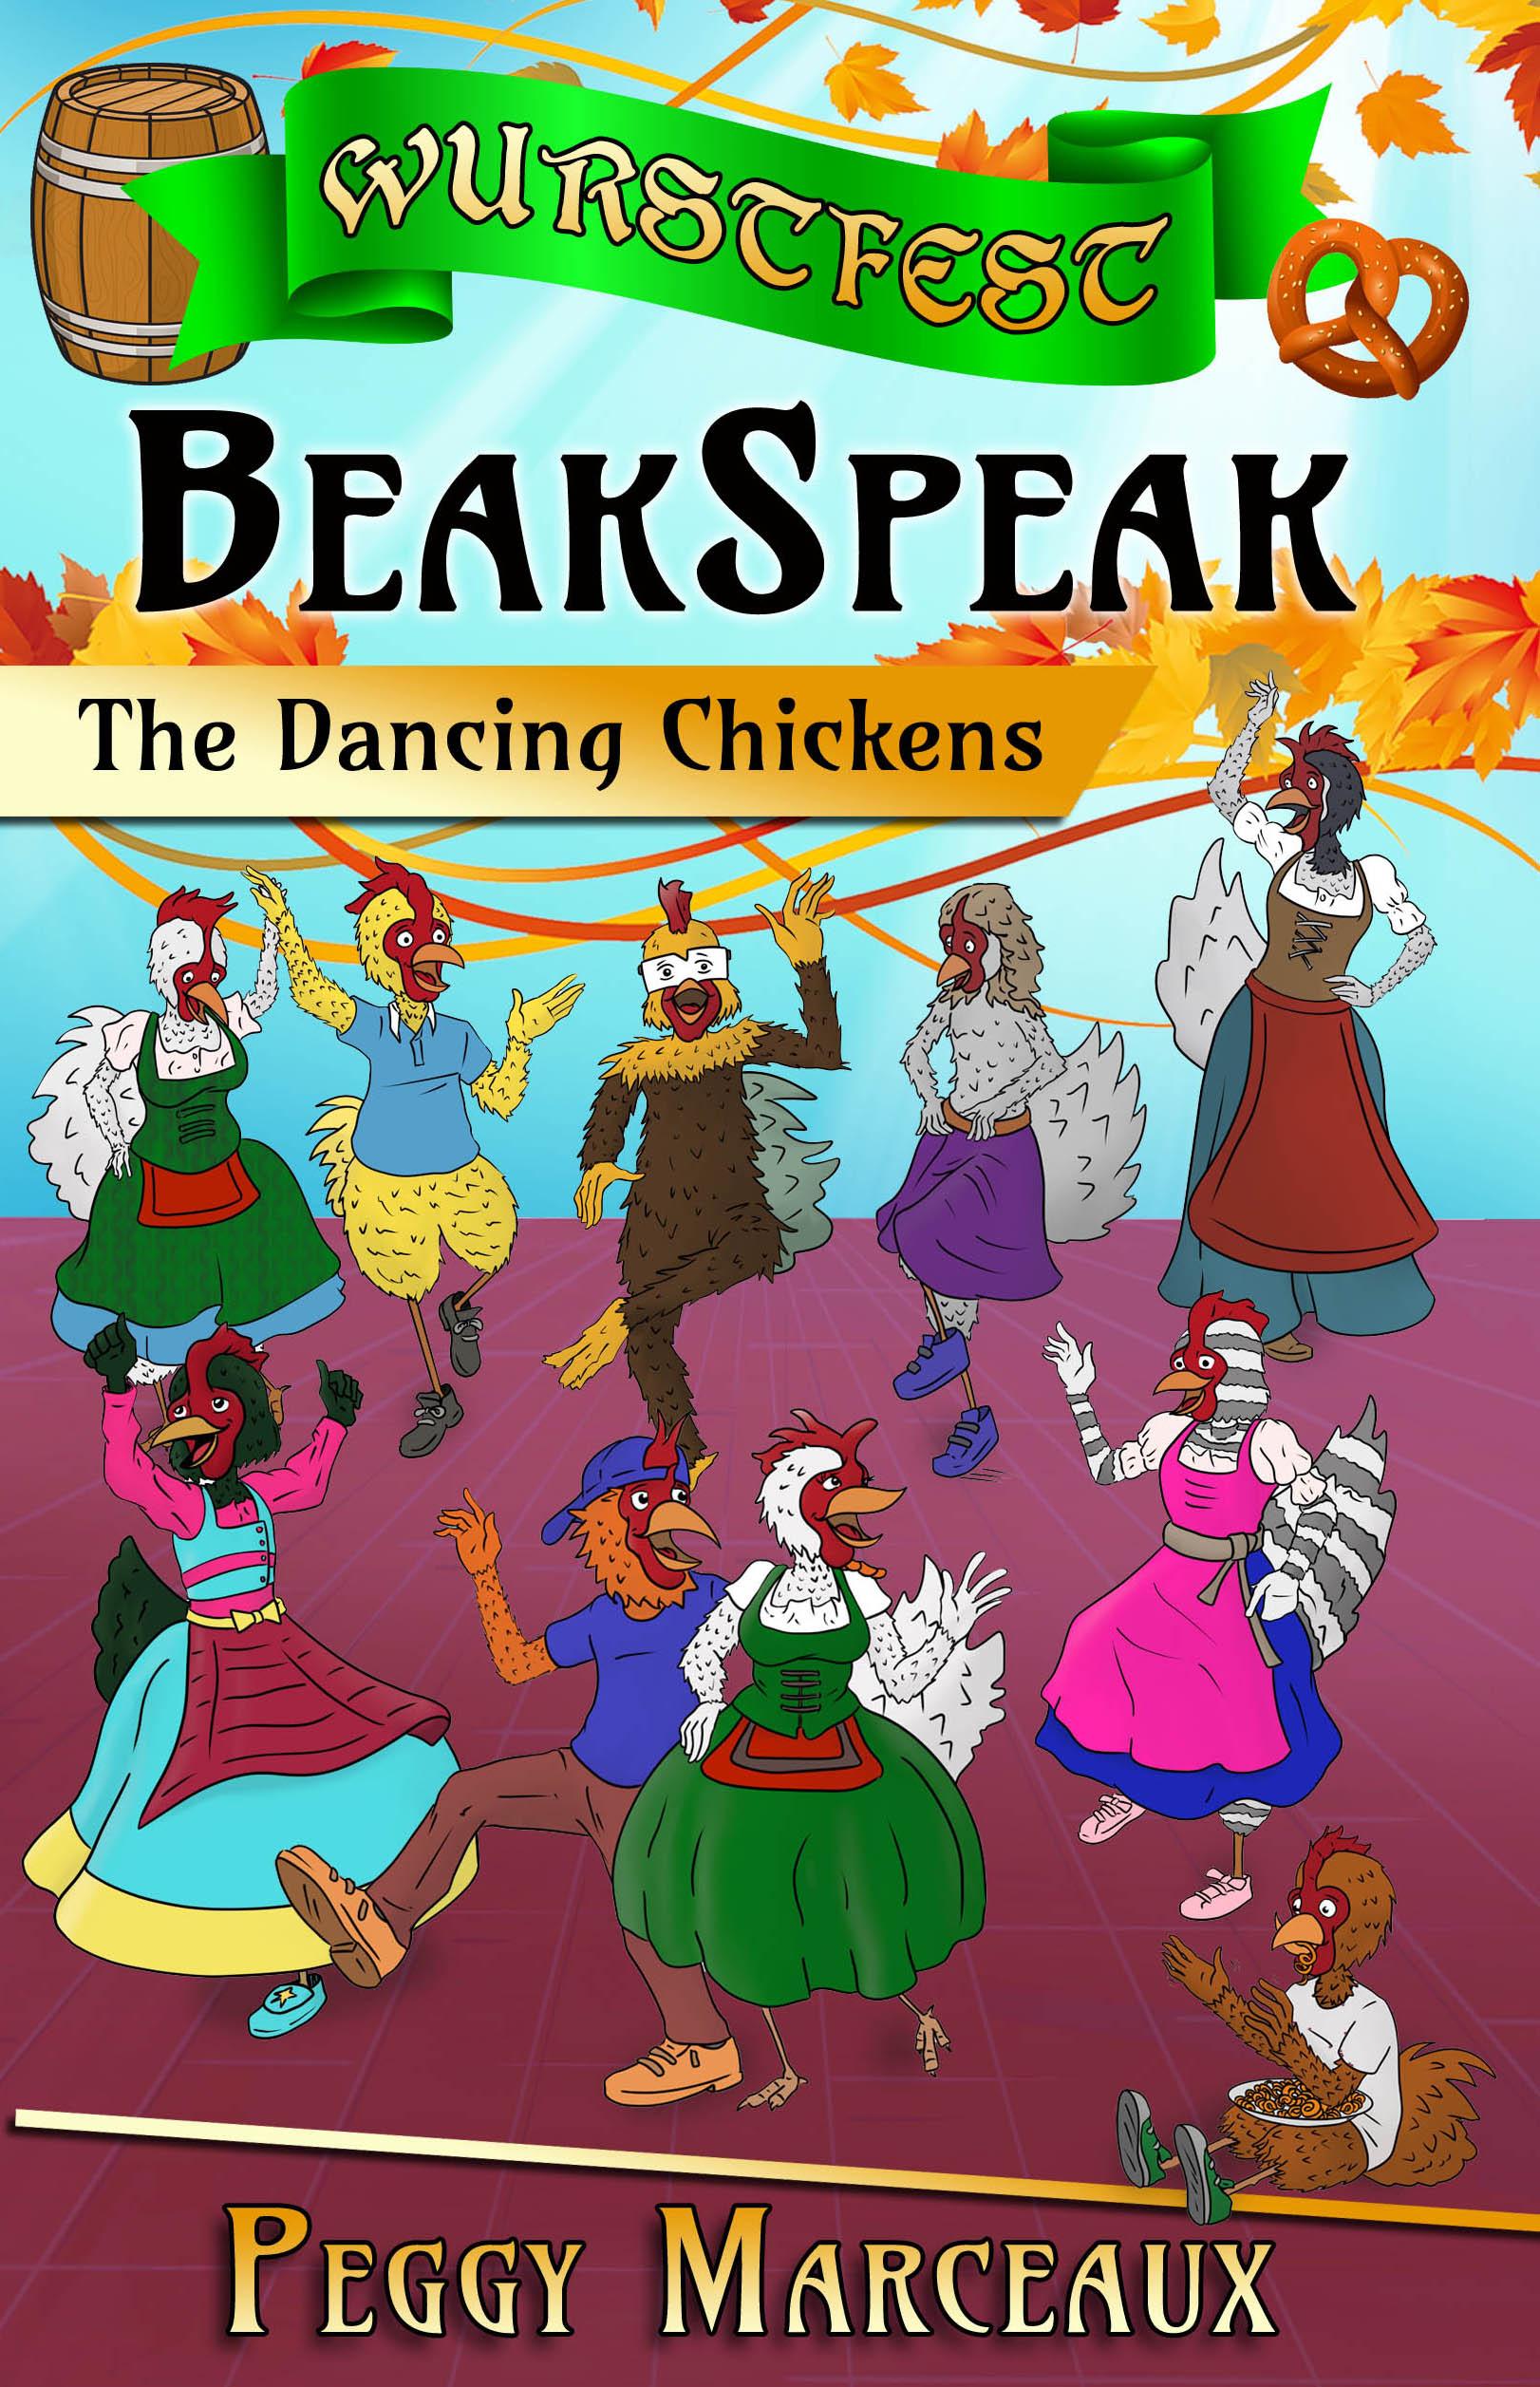 BeakSpeak 2: Dancing Chickens by author Peggy Marceaux